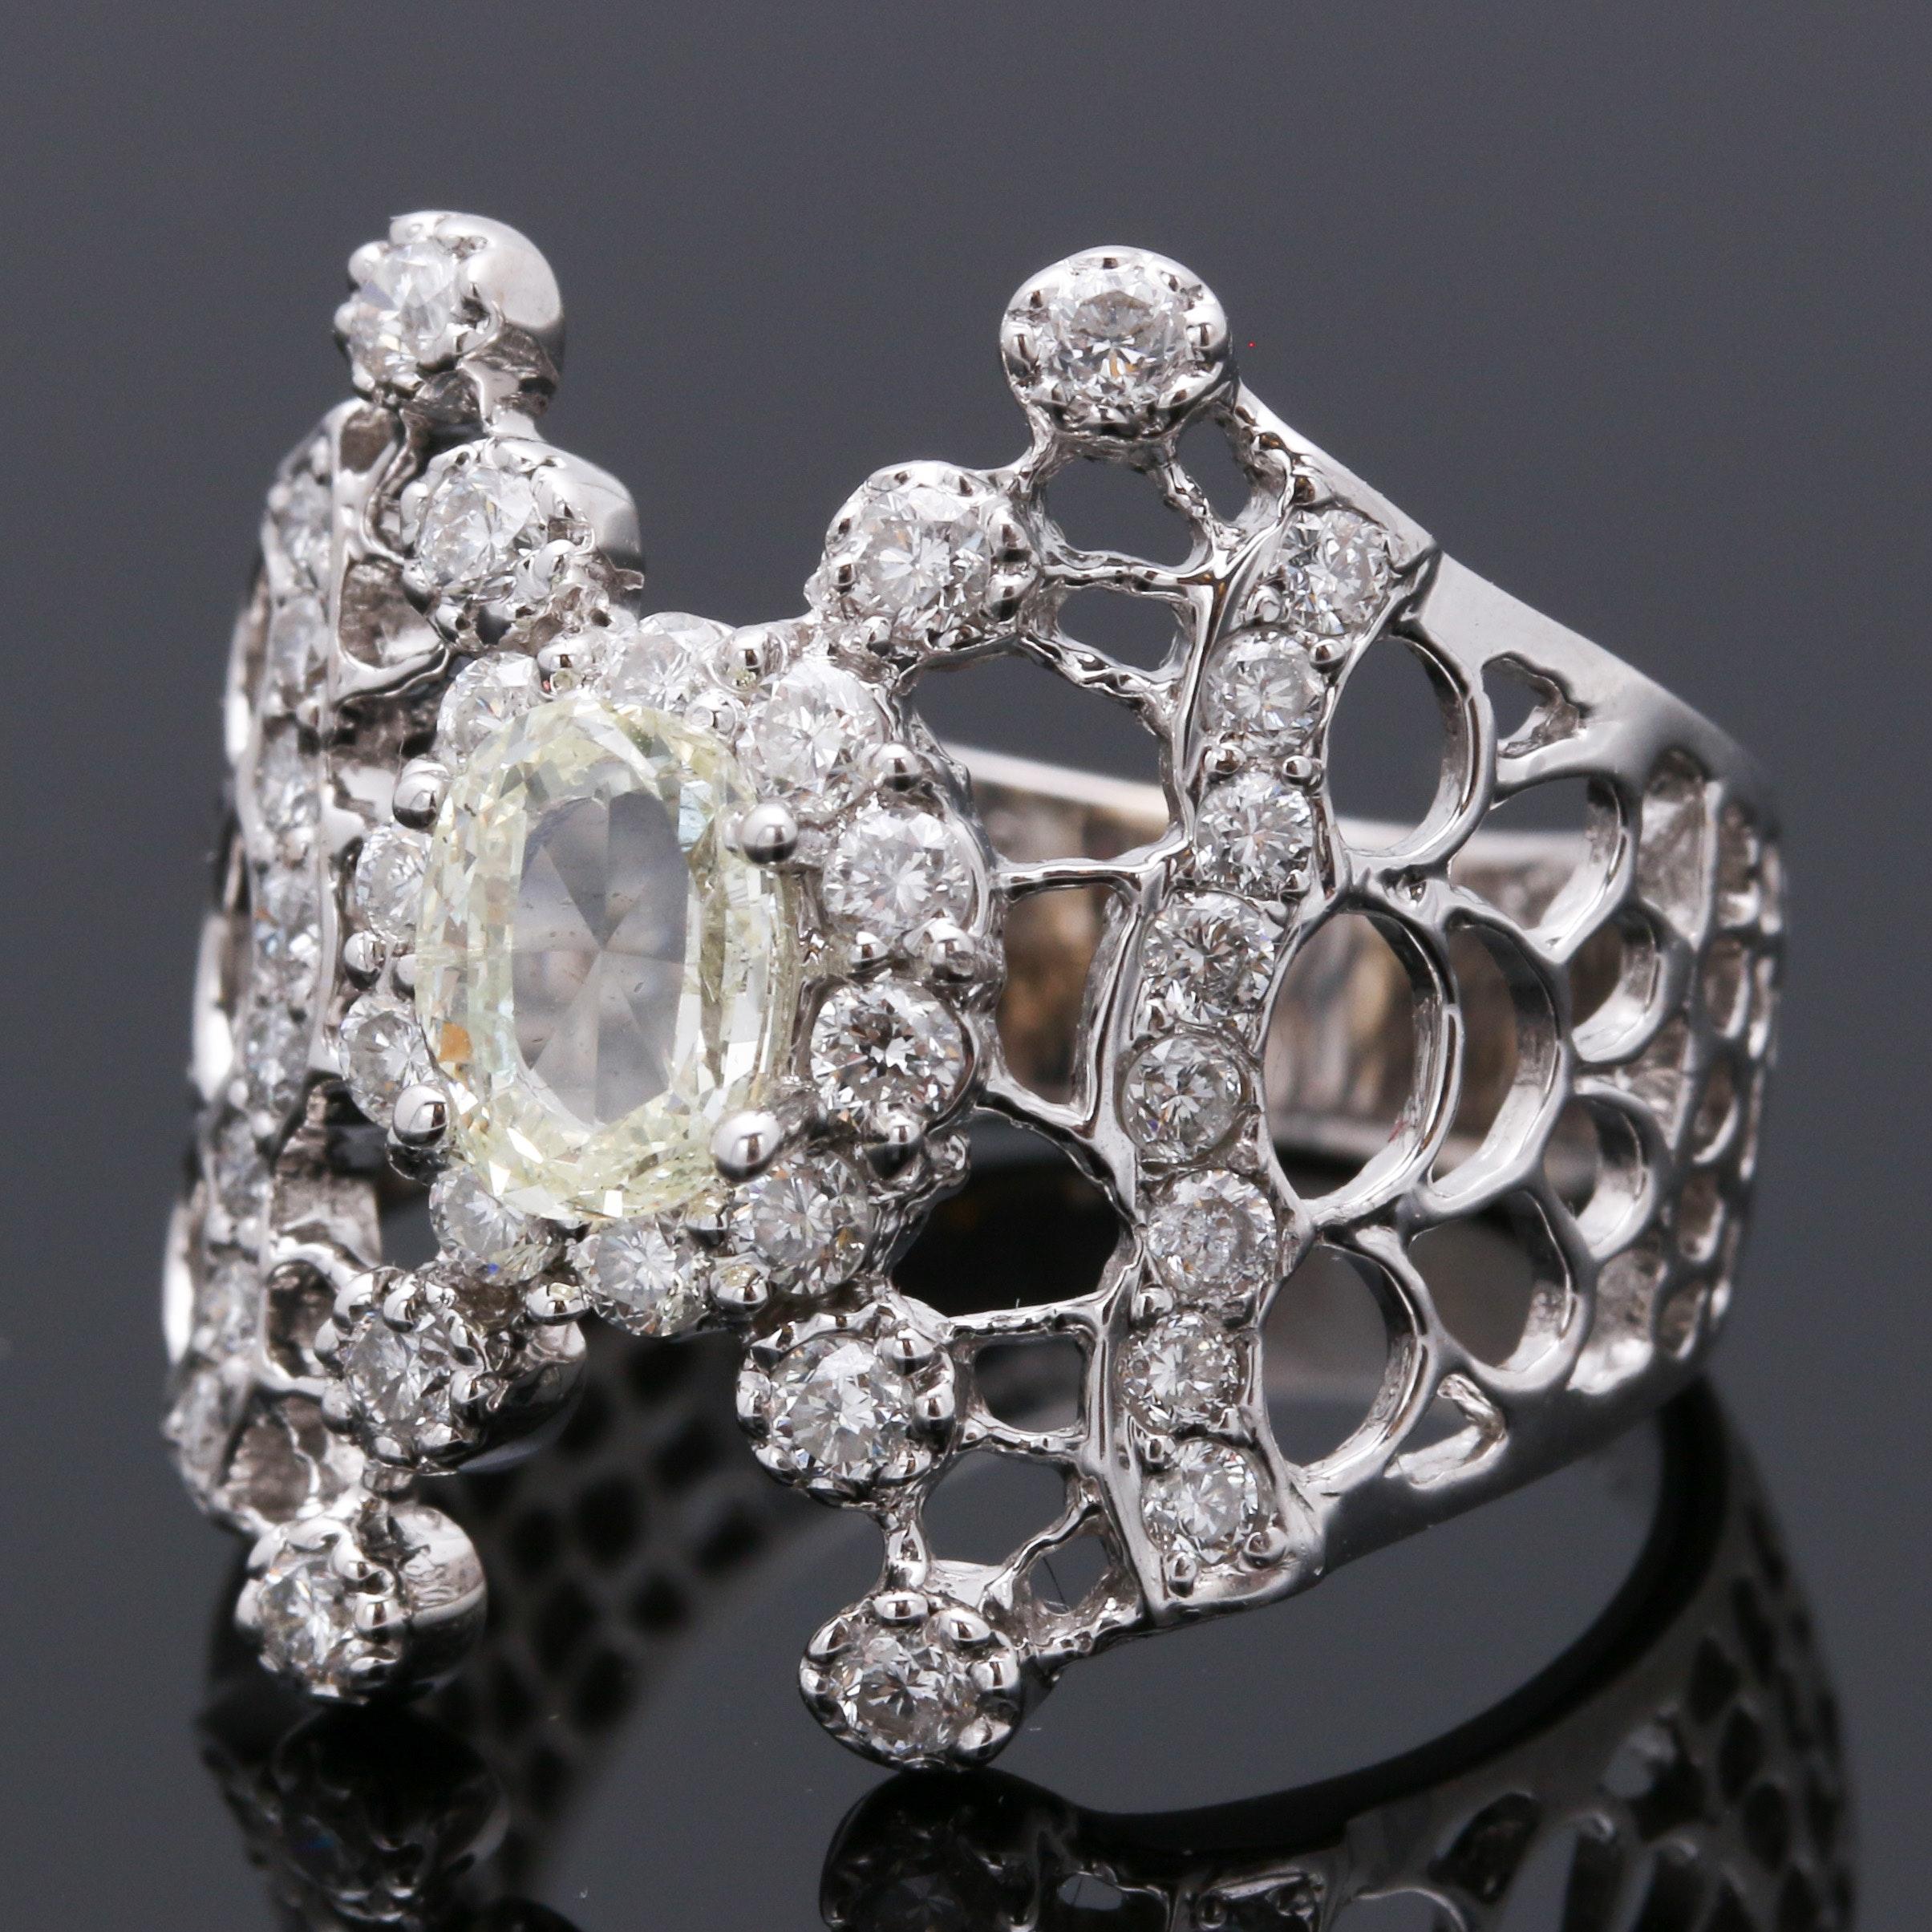 18K White Gold 1.06 CTW Diamond Ring